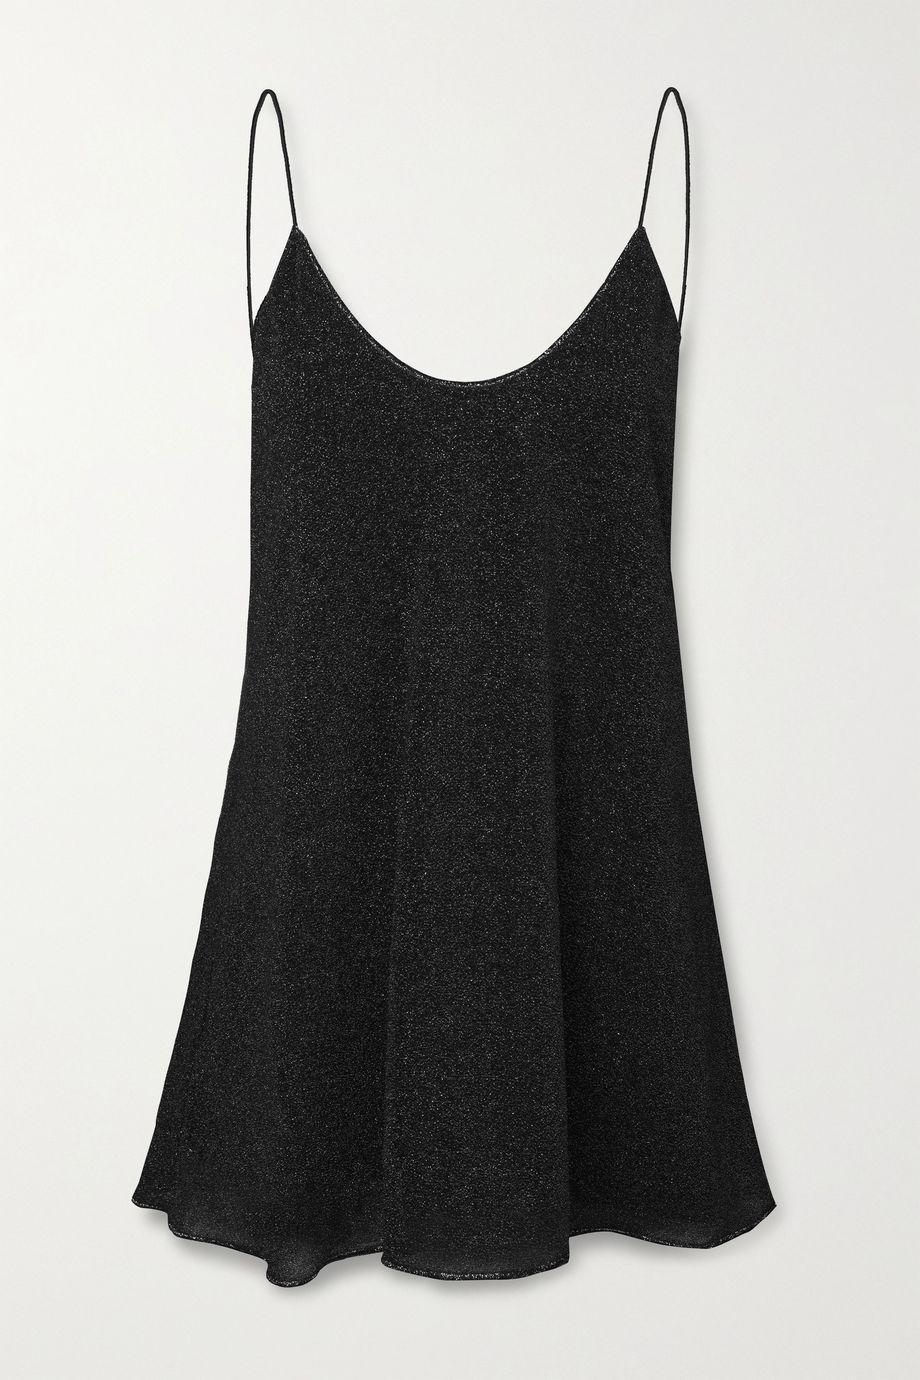 Oséree Lumière Lurex mini dress